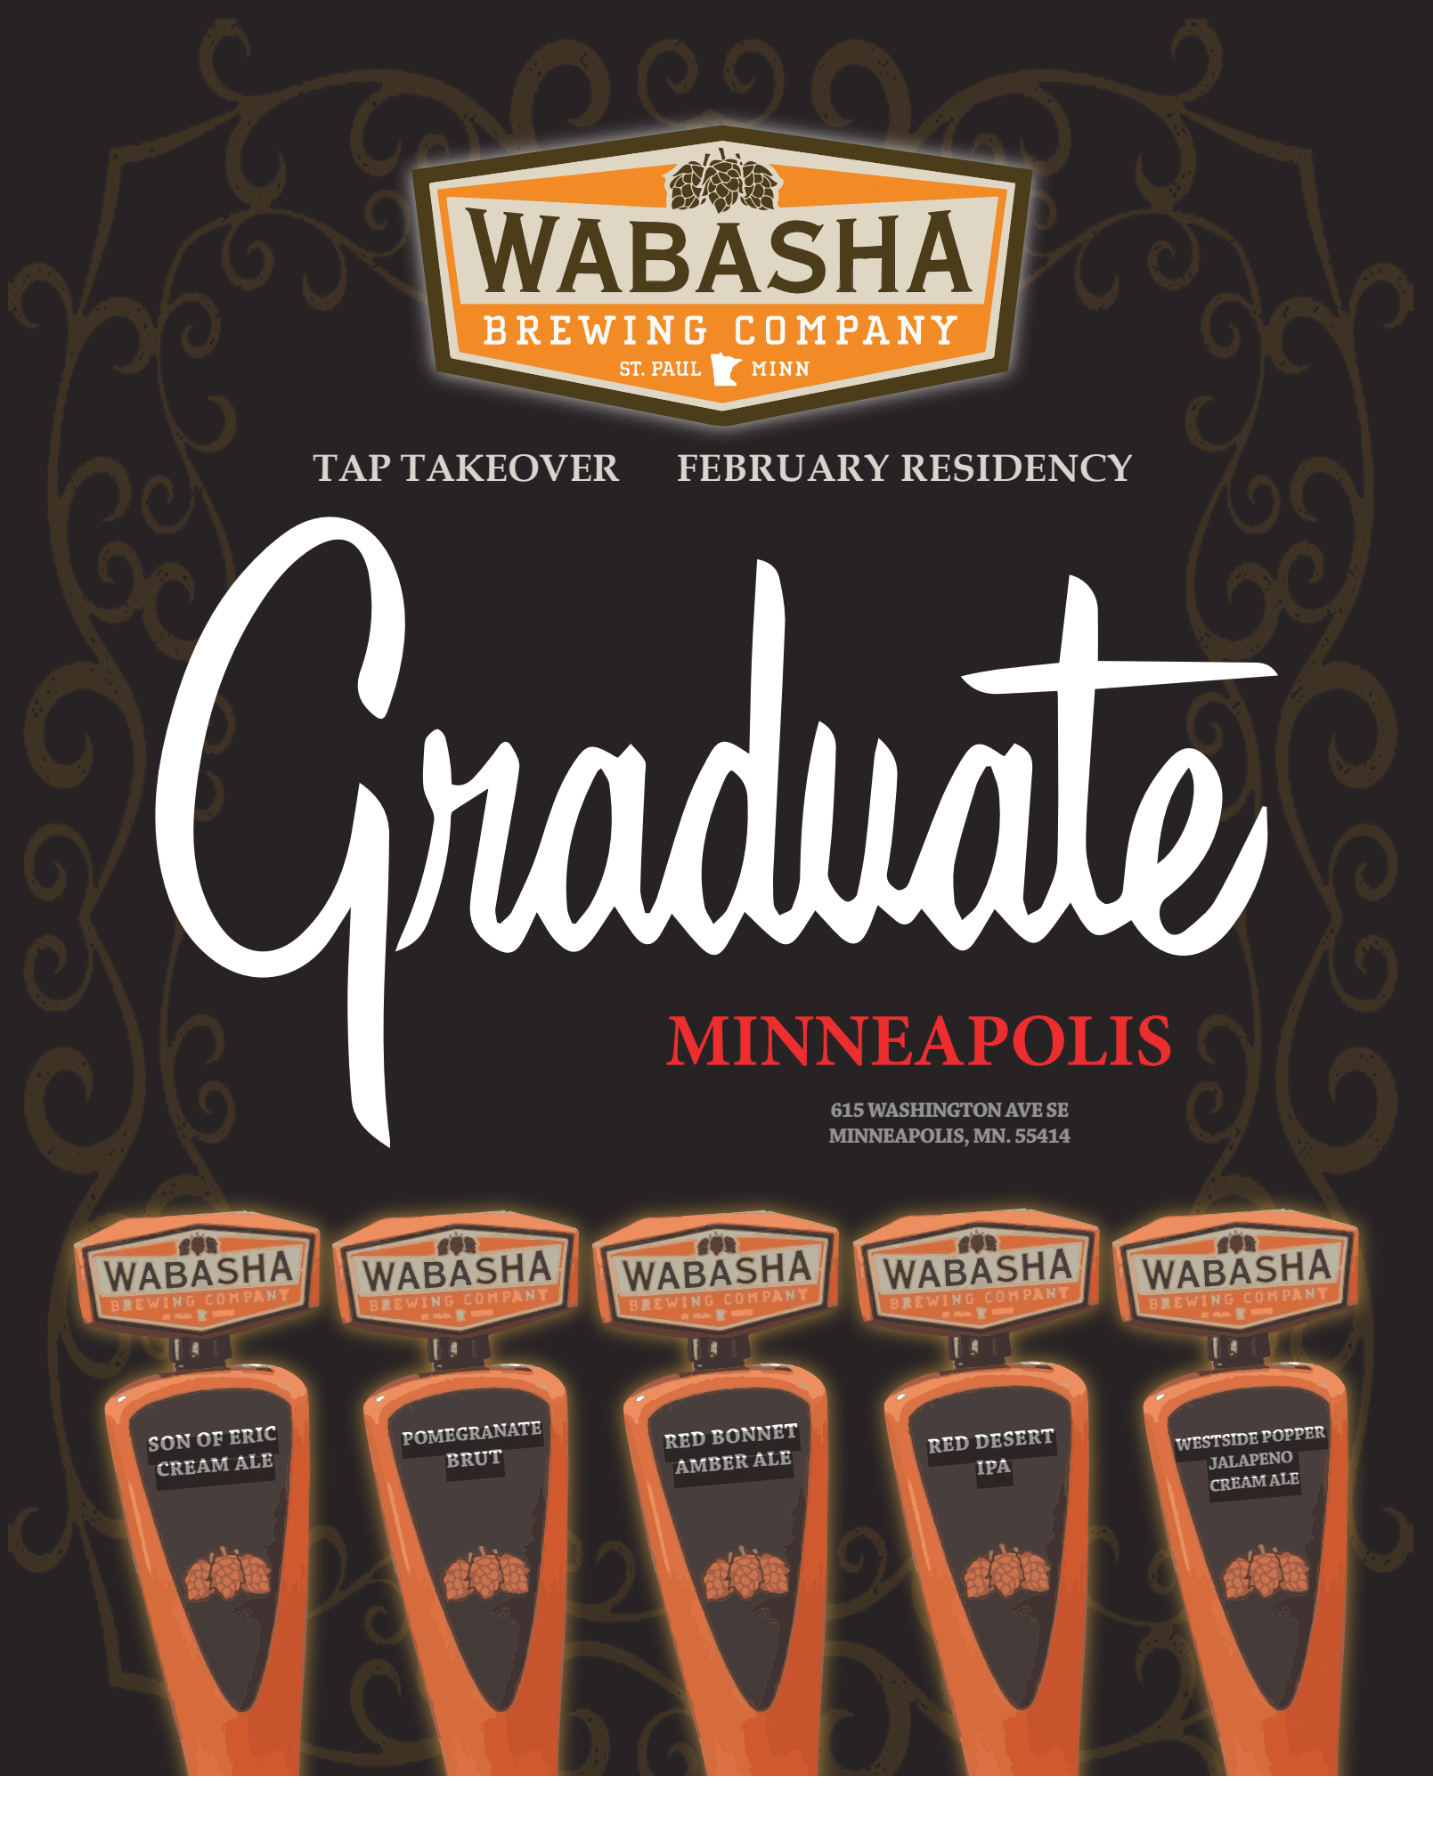 Wabasha Brewing Tap Takeover